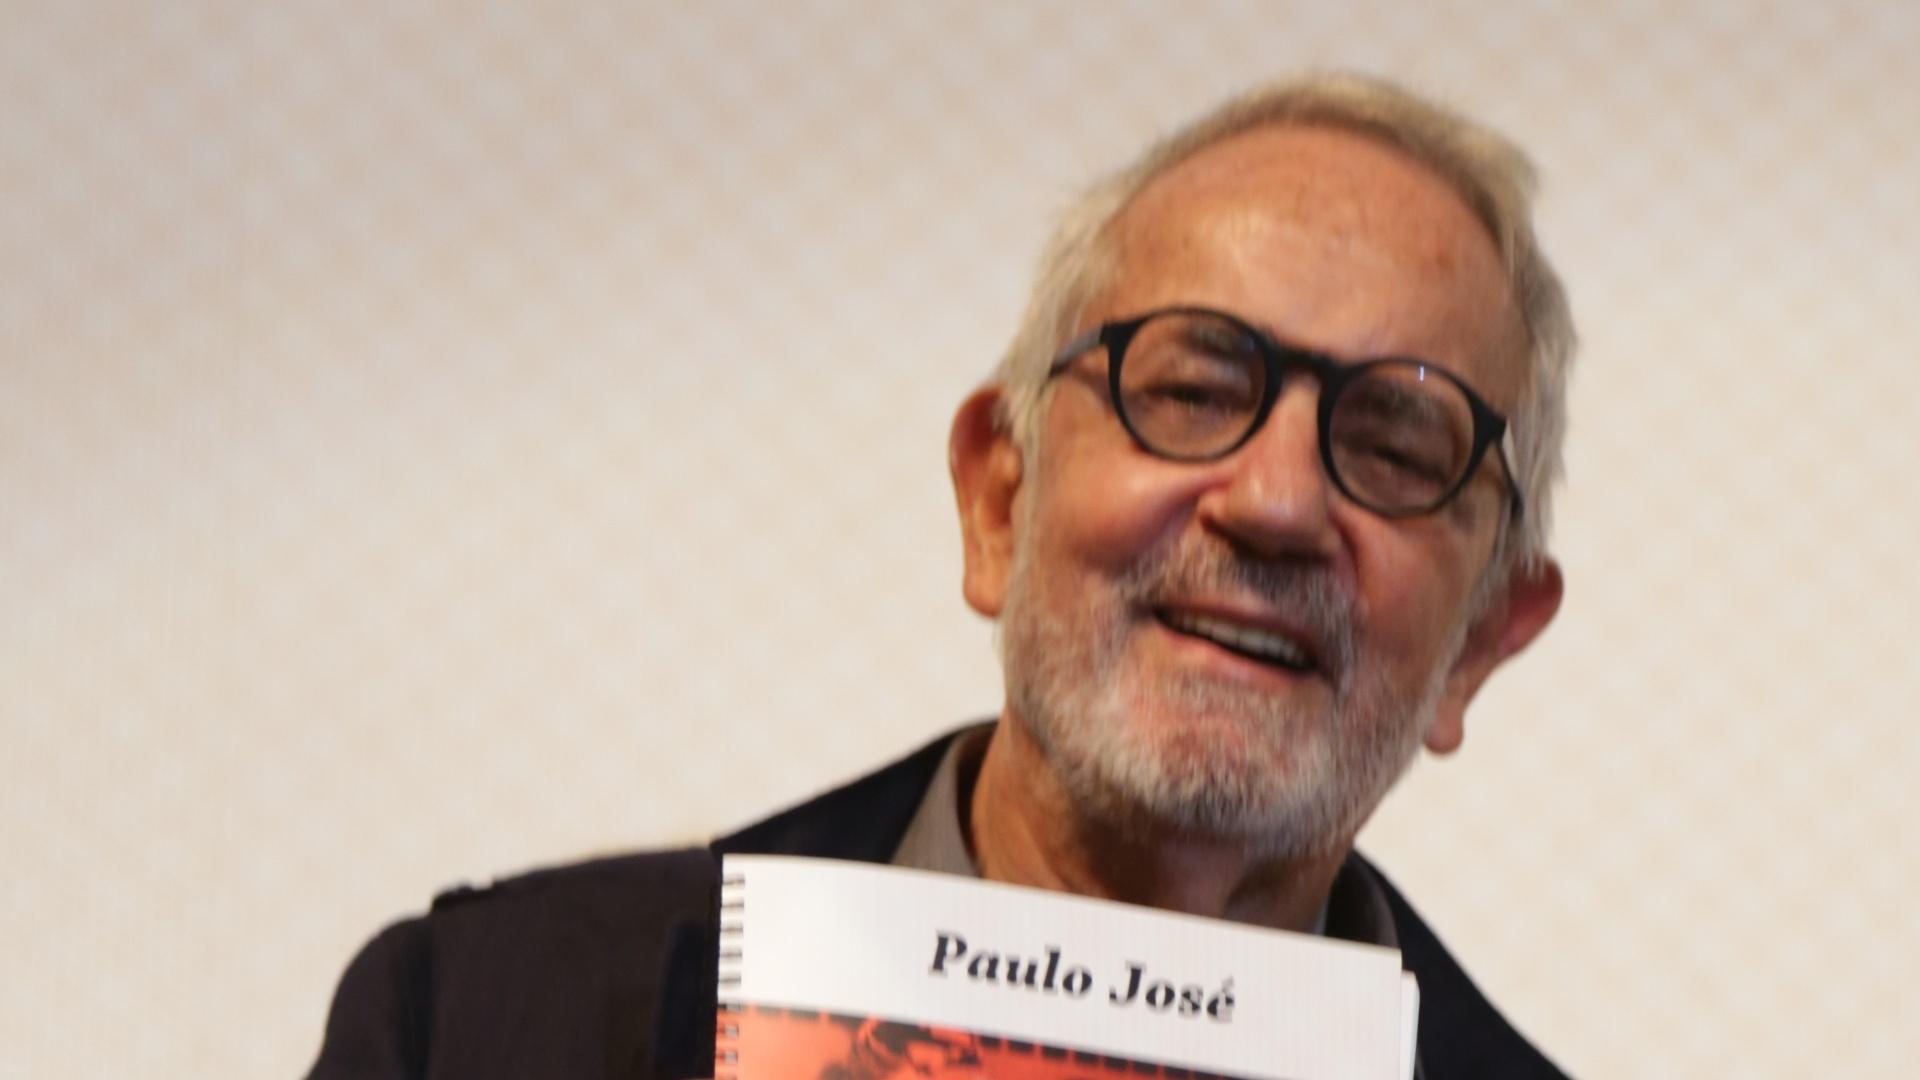 17.set.2014 - Homenageado no 21° Festival de Vitória, ator Paulo José recebe o troféu Marlin Azul, no Theatro Carlos Gomes